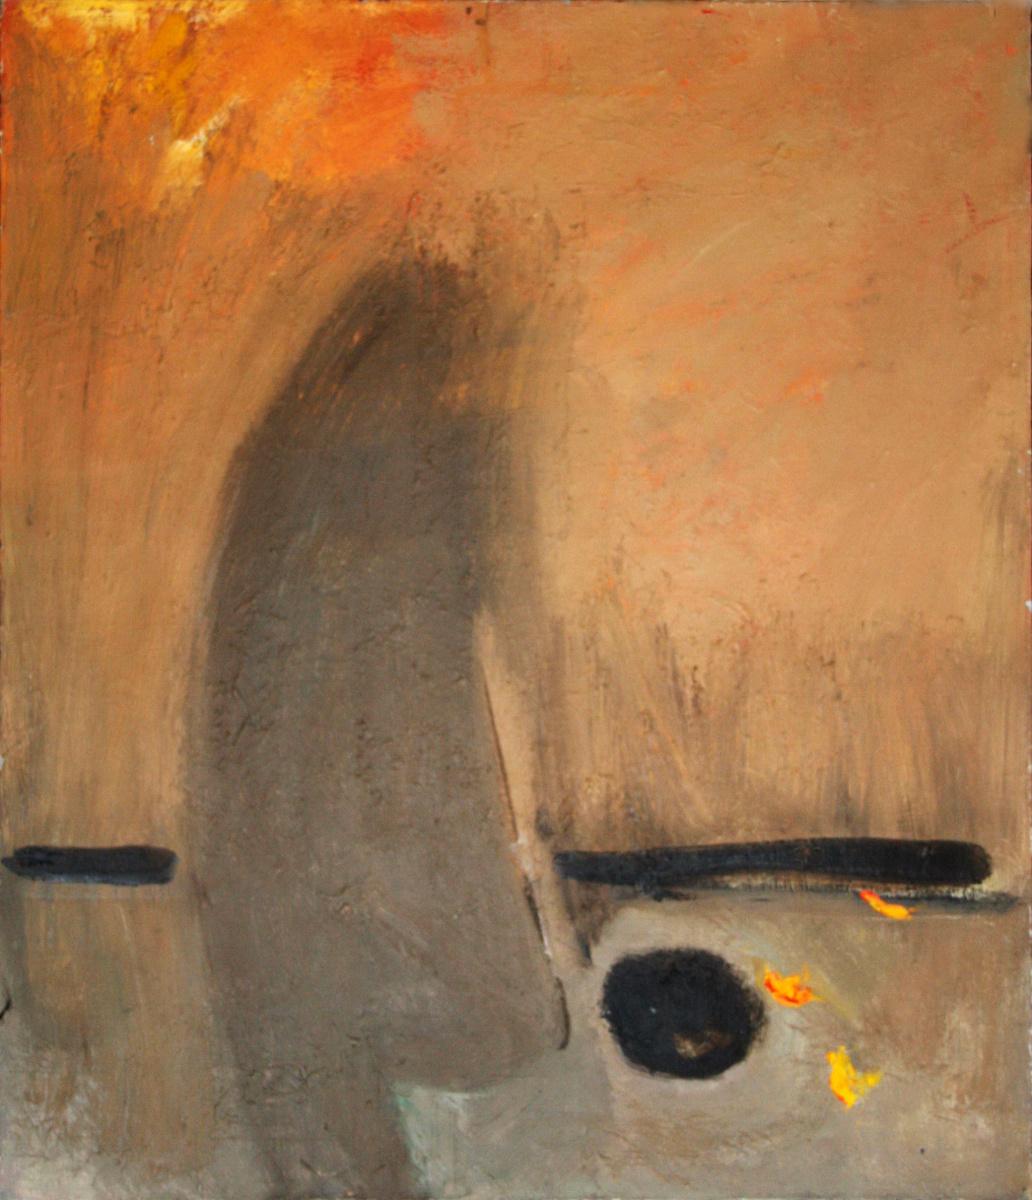 "Konstantin Kosarevsky. Kosarevsky Kostyantin ""STOP OSIN"" 1996 canvas ol_ya 70x60 cm. Kosarevskyi Konstiantyn ""THE LAST AUTUMN"" 1996 oil on canvas 70x60 cm."